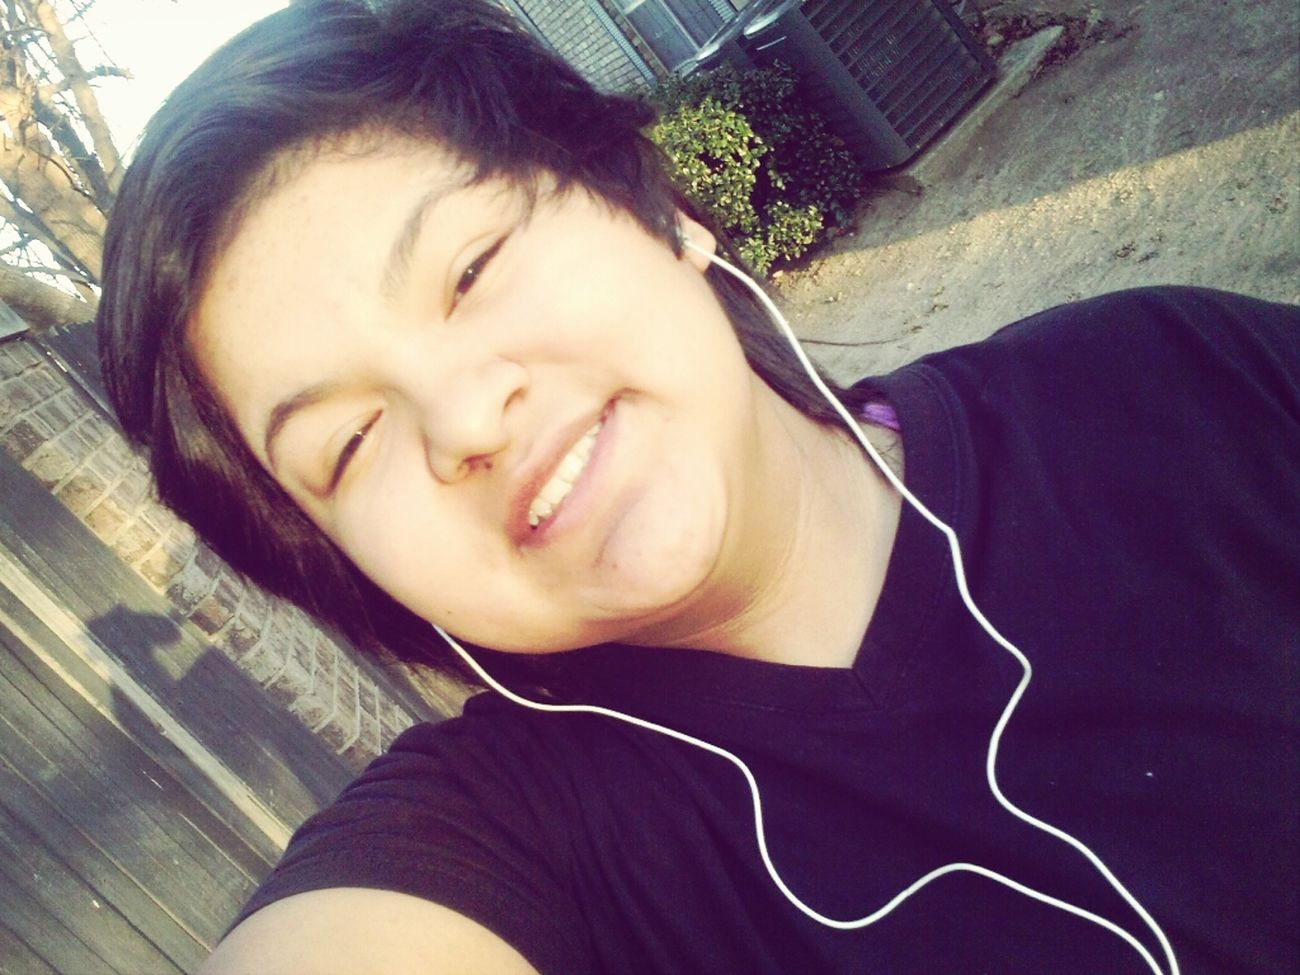 #outdoors #sunshine